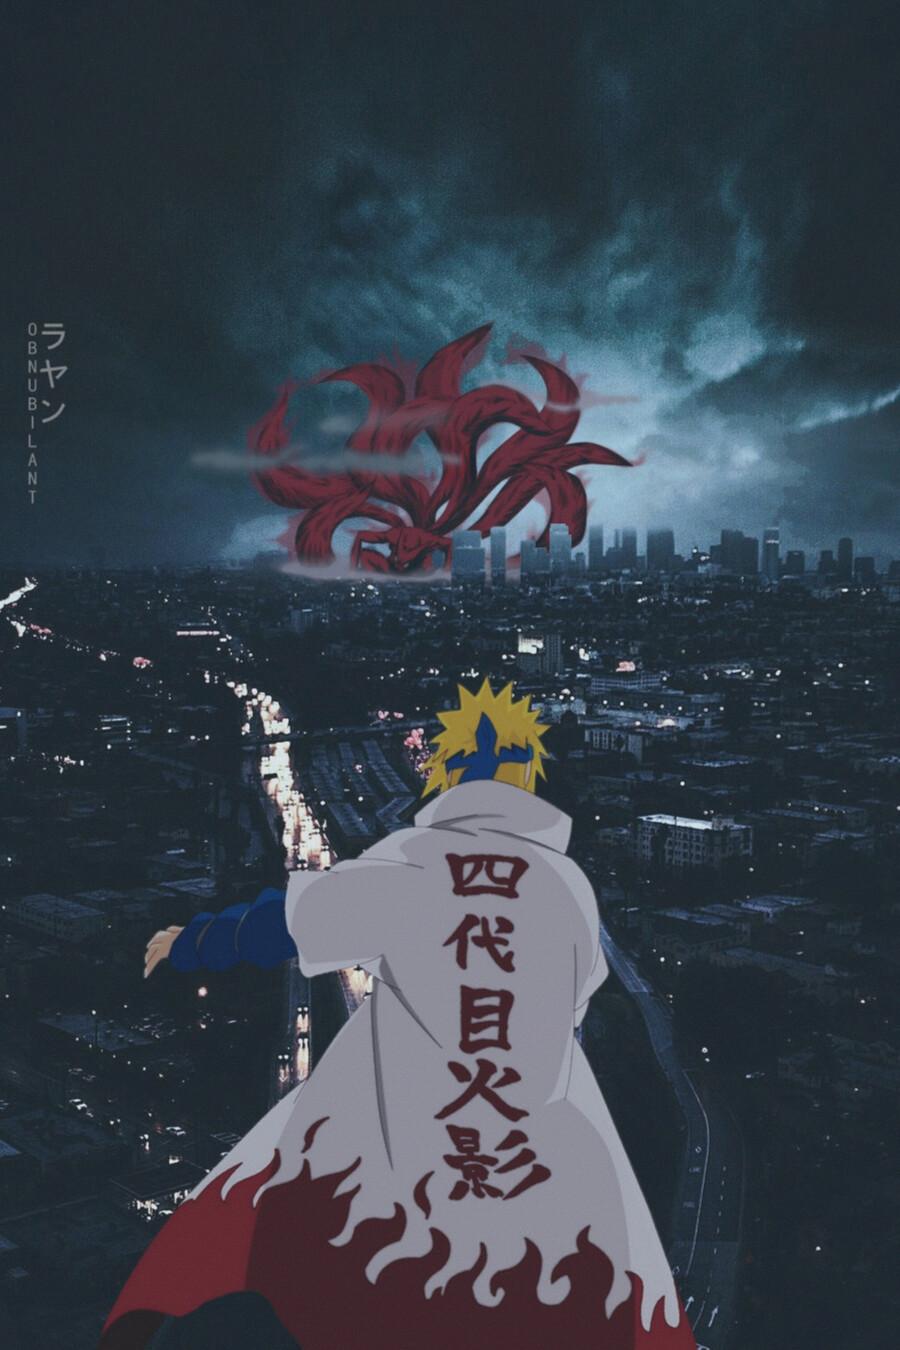 Minato vs Kurama wallpapper hd